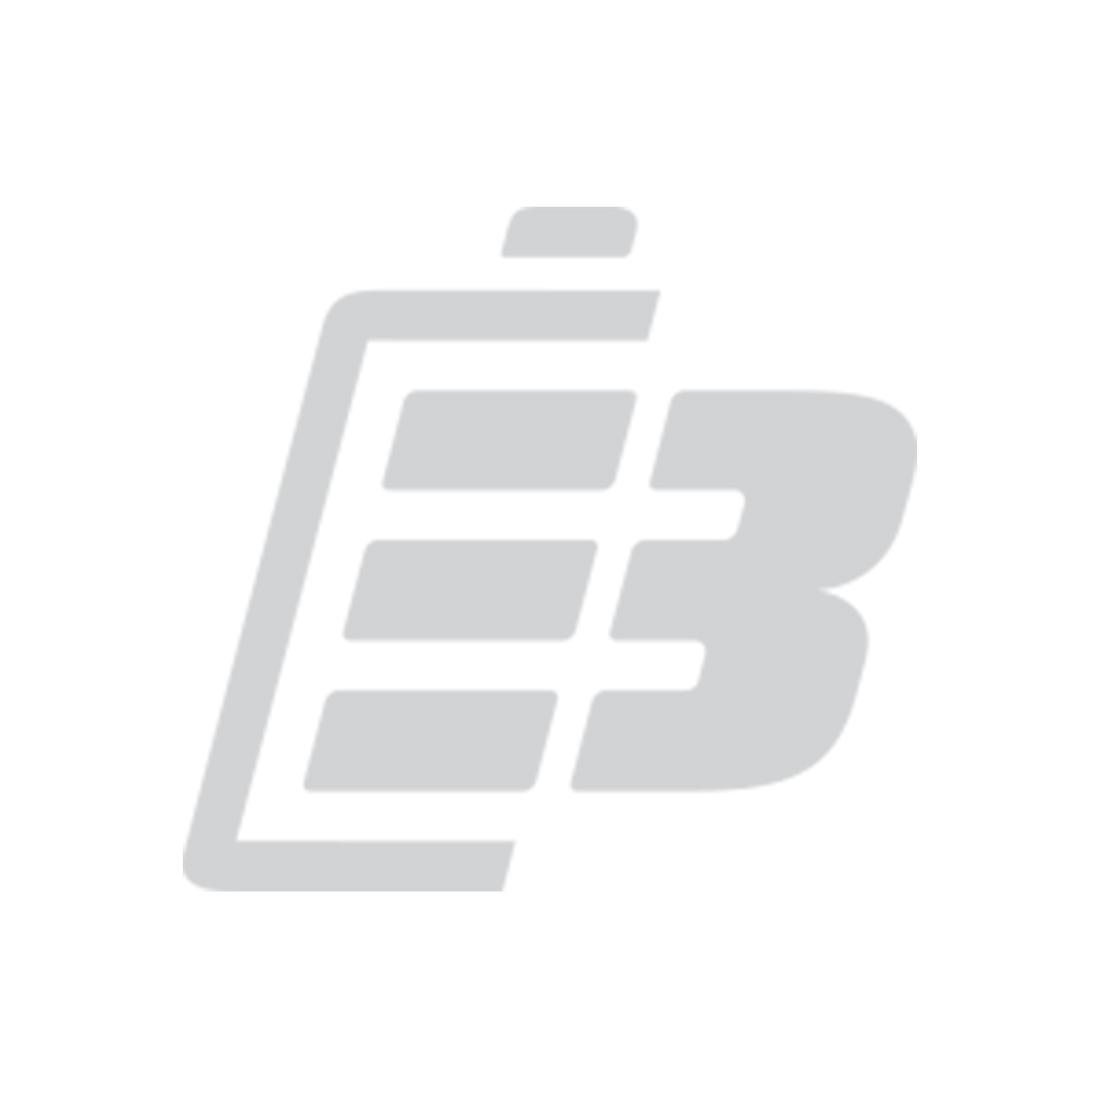 MP3 battery Creative Zen Micro Photo_1